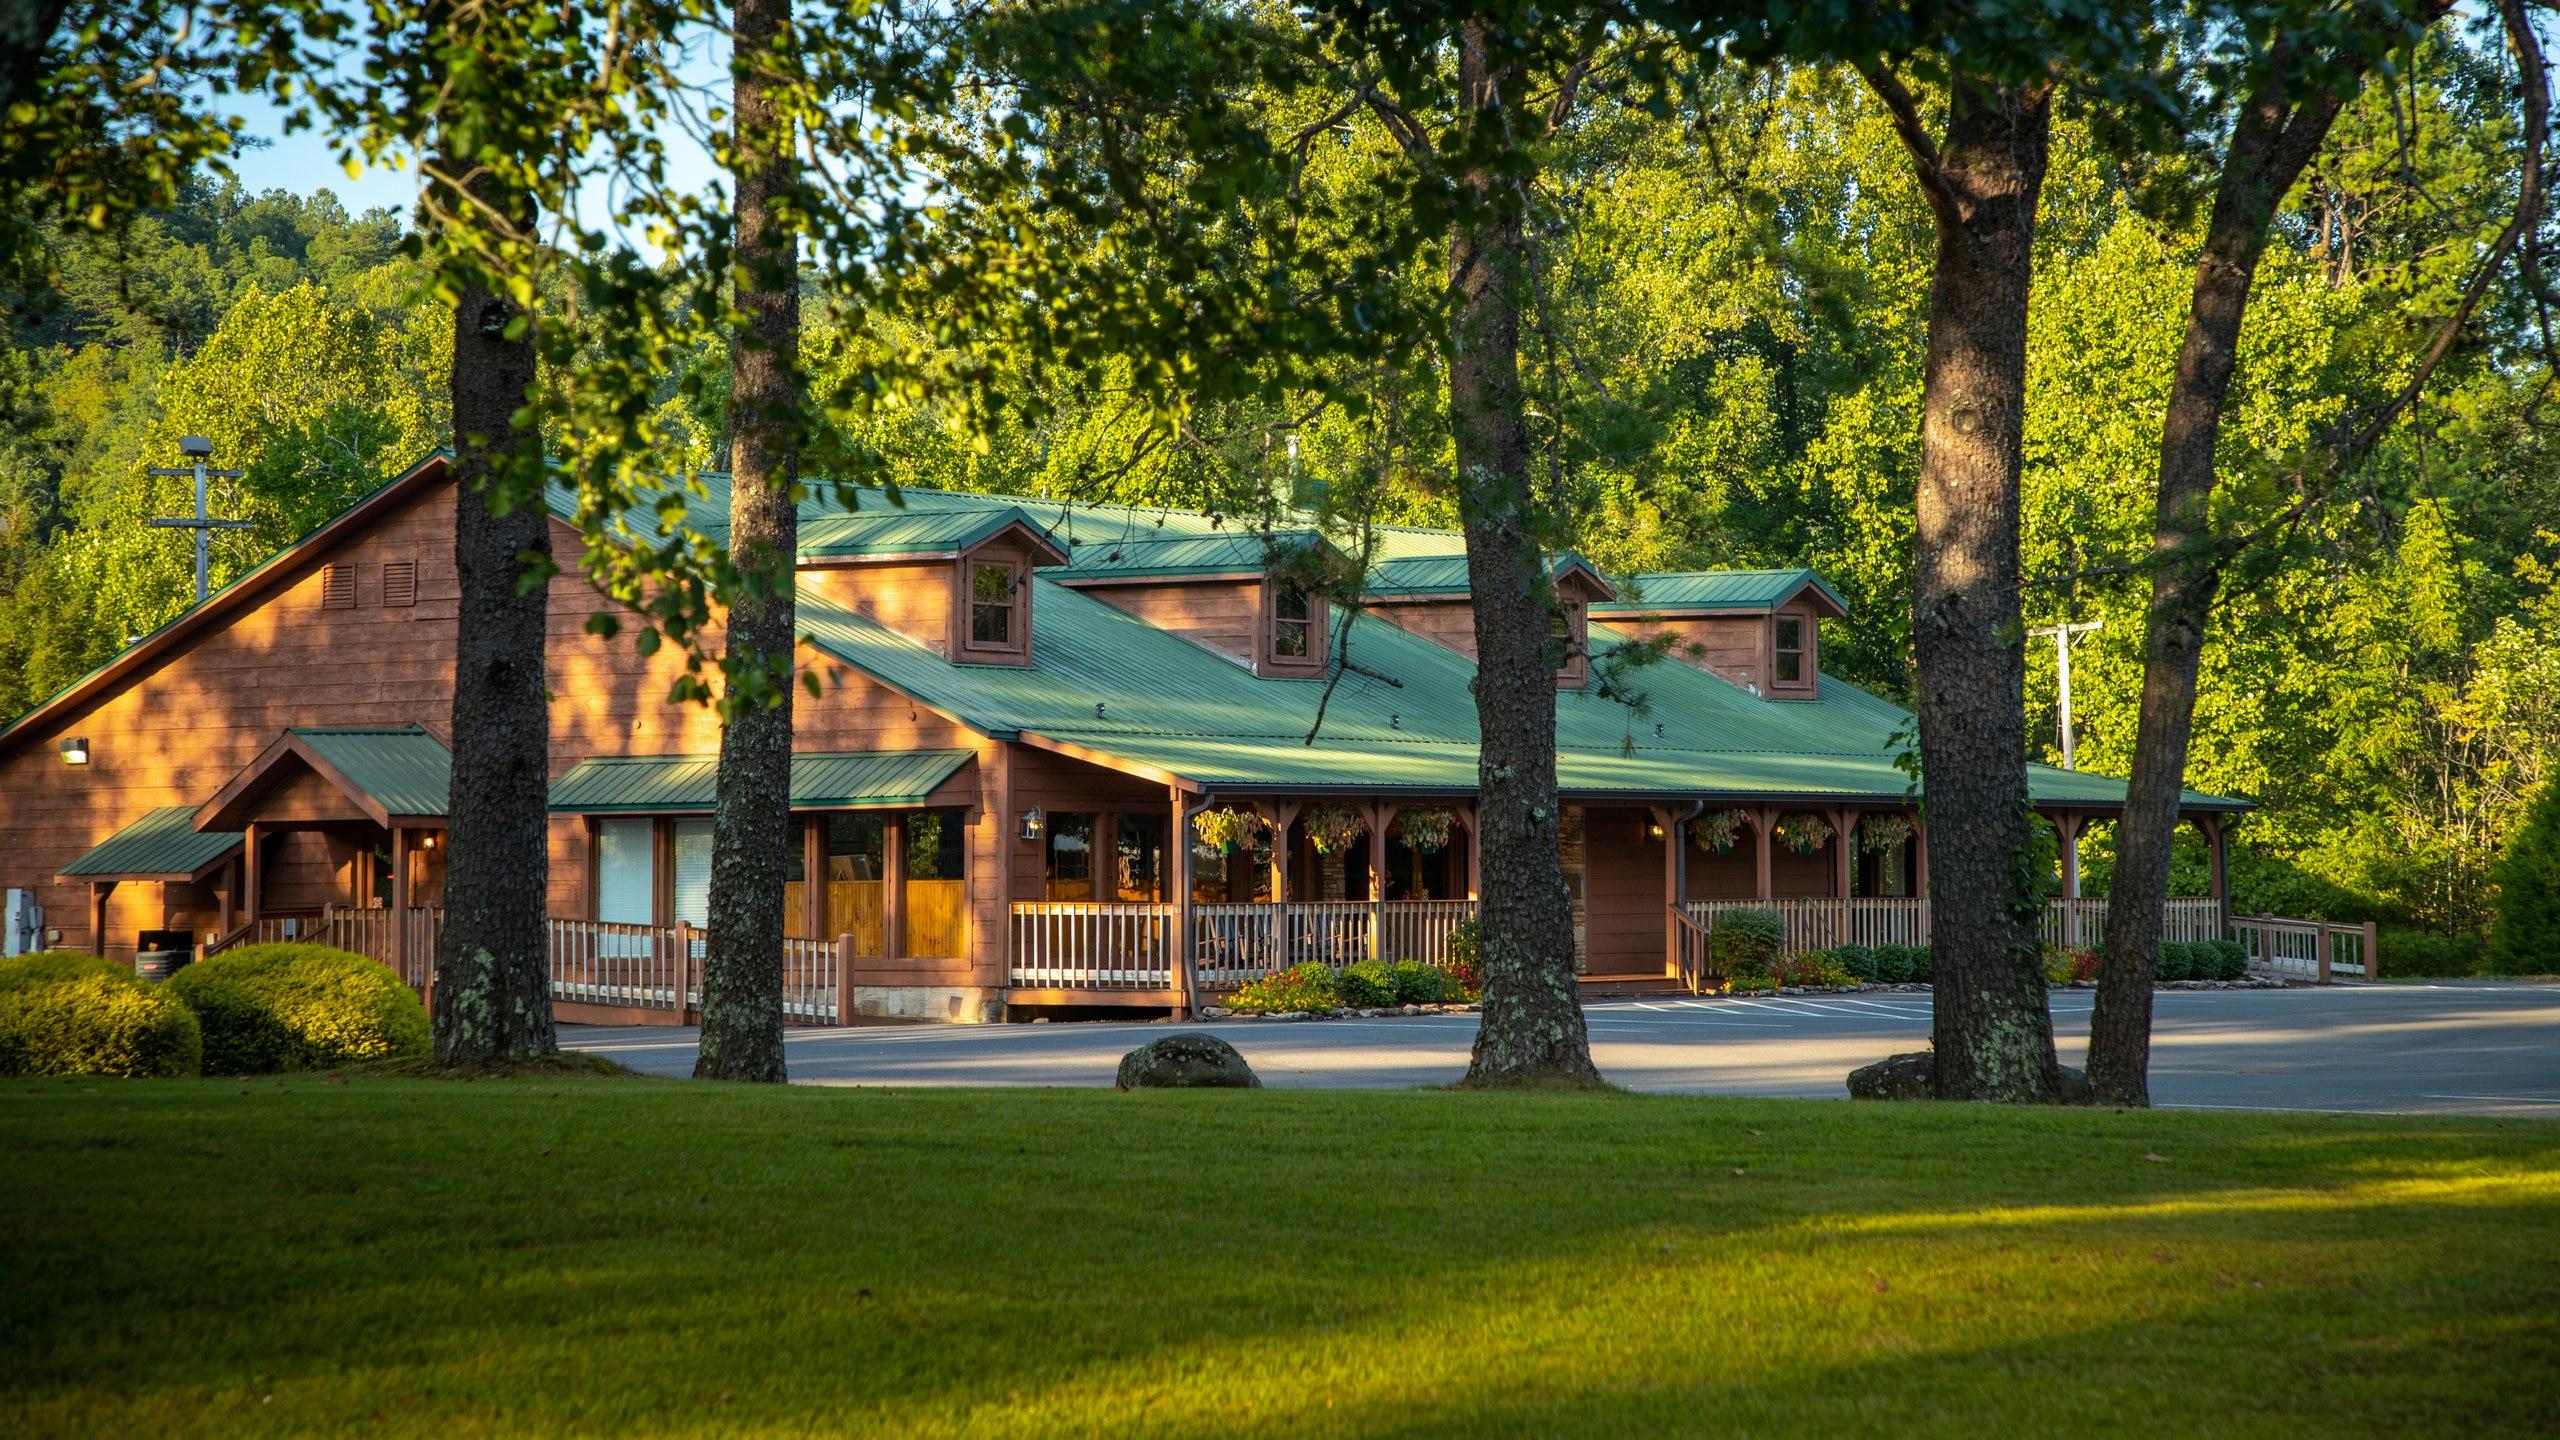 Bent Creek Golf Club, Pittman Center, Tennessee, United States of America